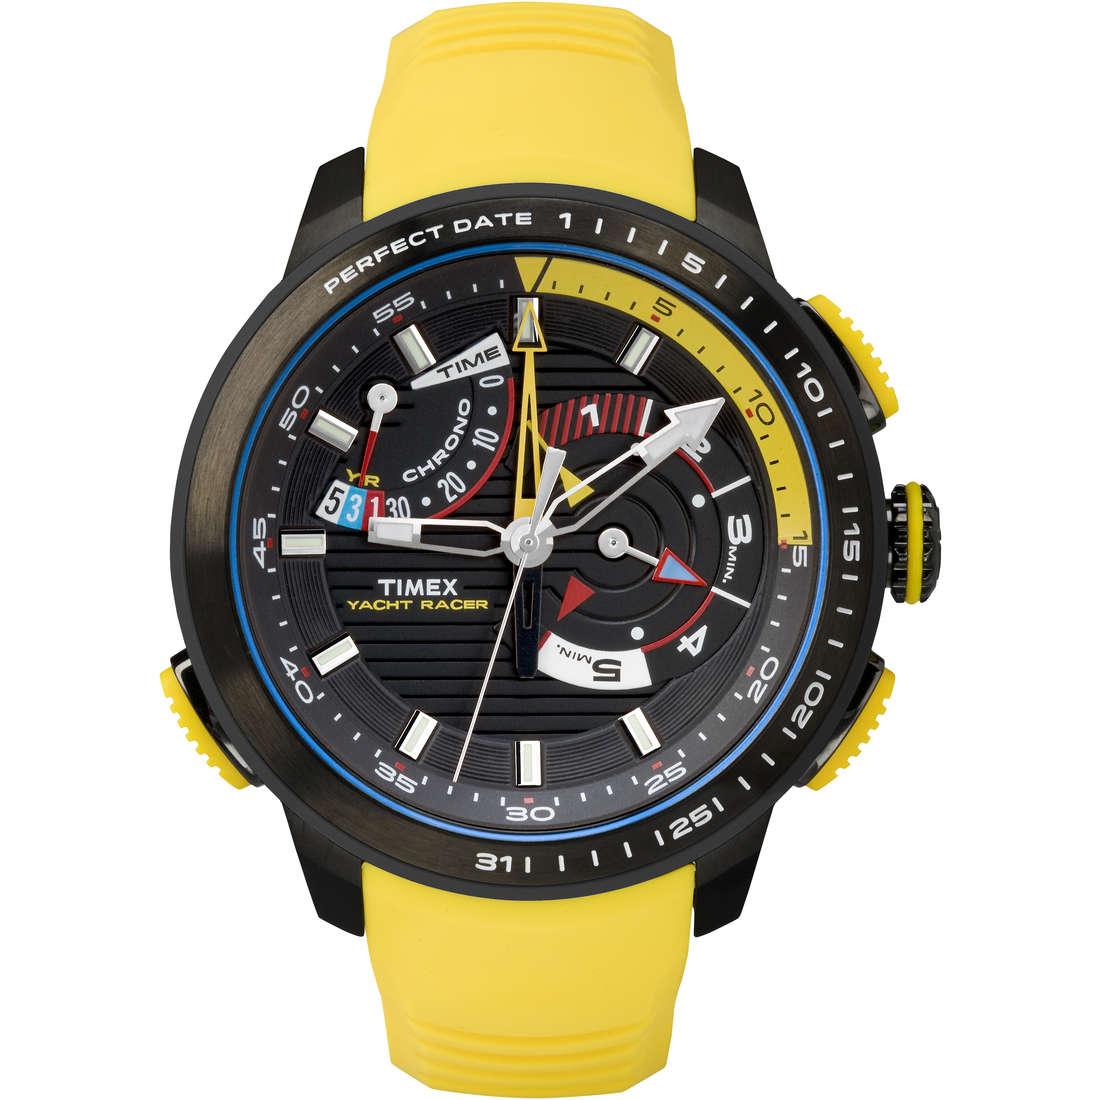 montre multifonction homme Timex Iq Yatch Racer TW2P44500